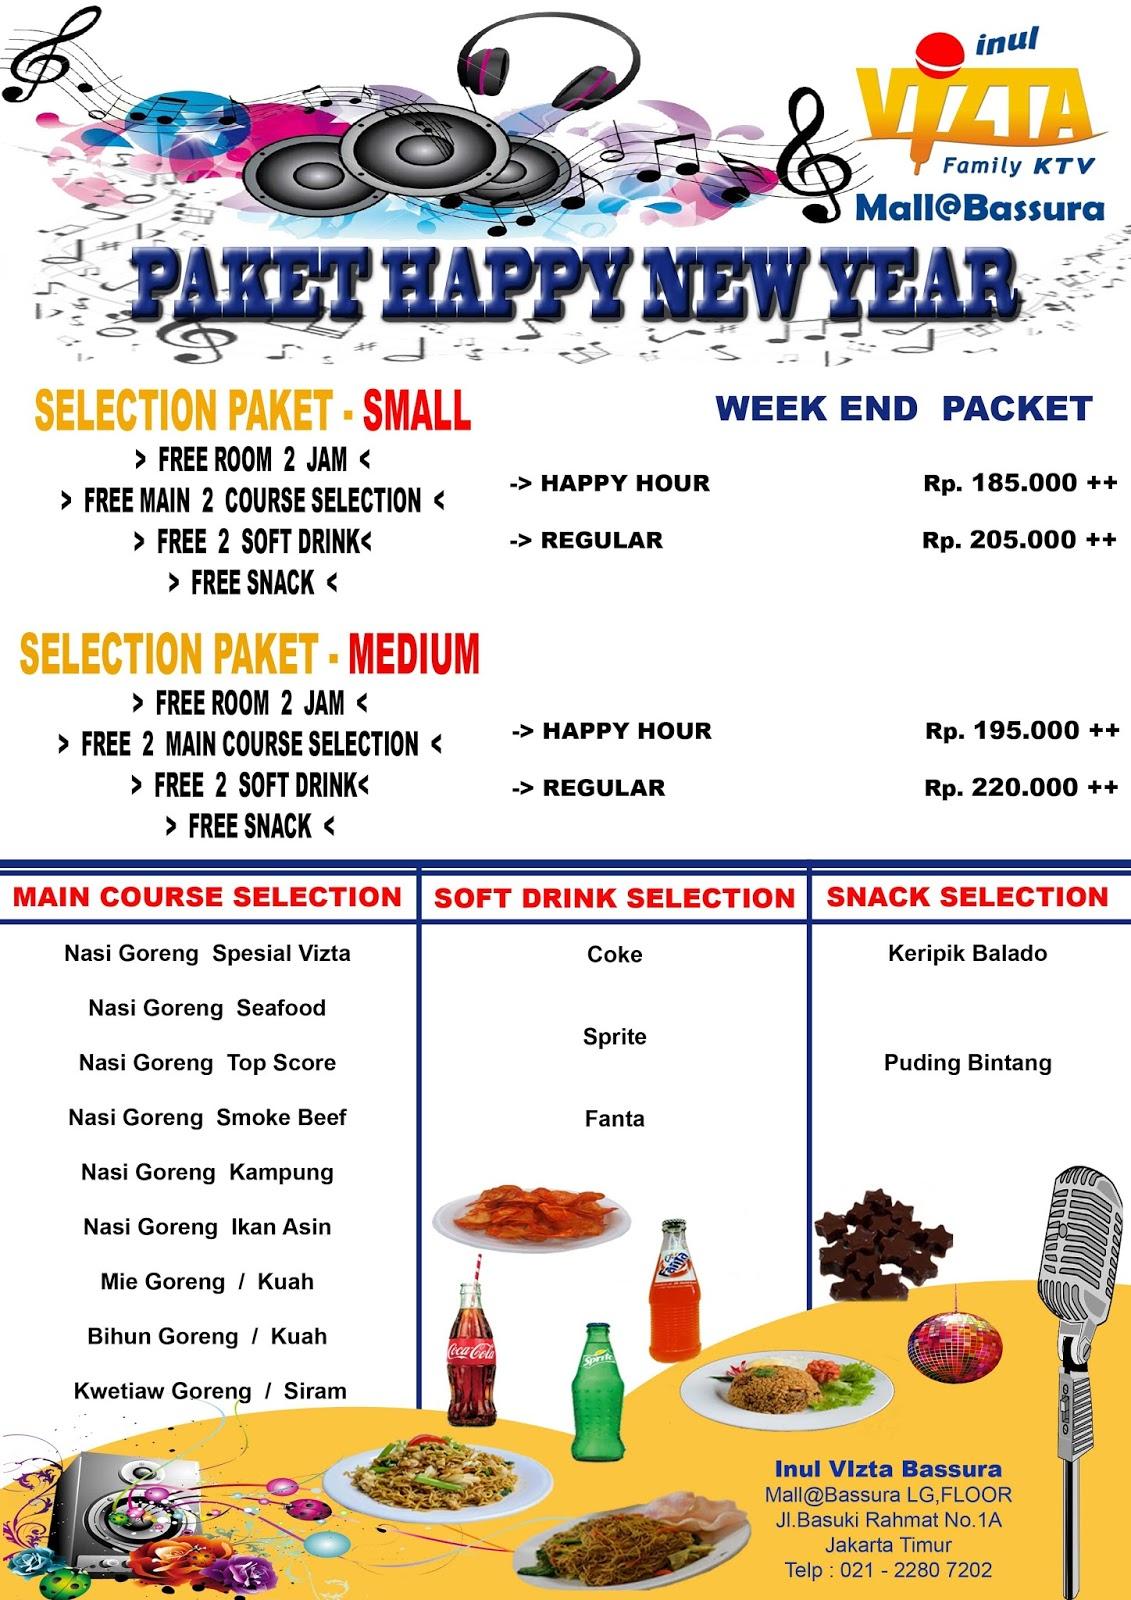 PAKET HAPPY NEW YEAR INUL VIZTA MALL@BASSURA WEEK END, PAKET HAPPY NEW YEAR INUL VIZTA BASSURA WEEK END